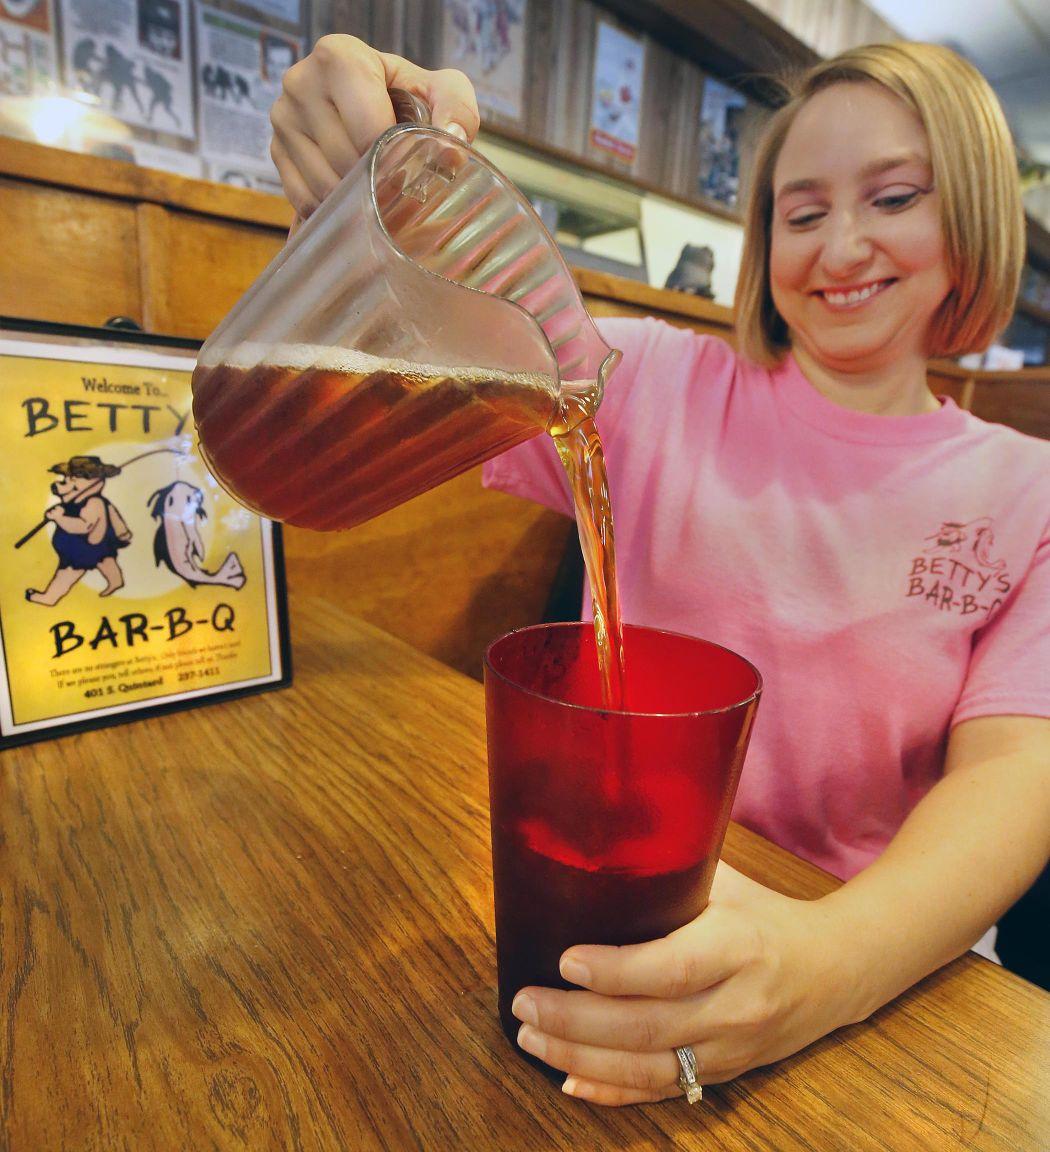 Betty's BBQ